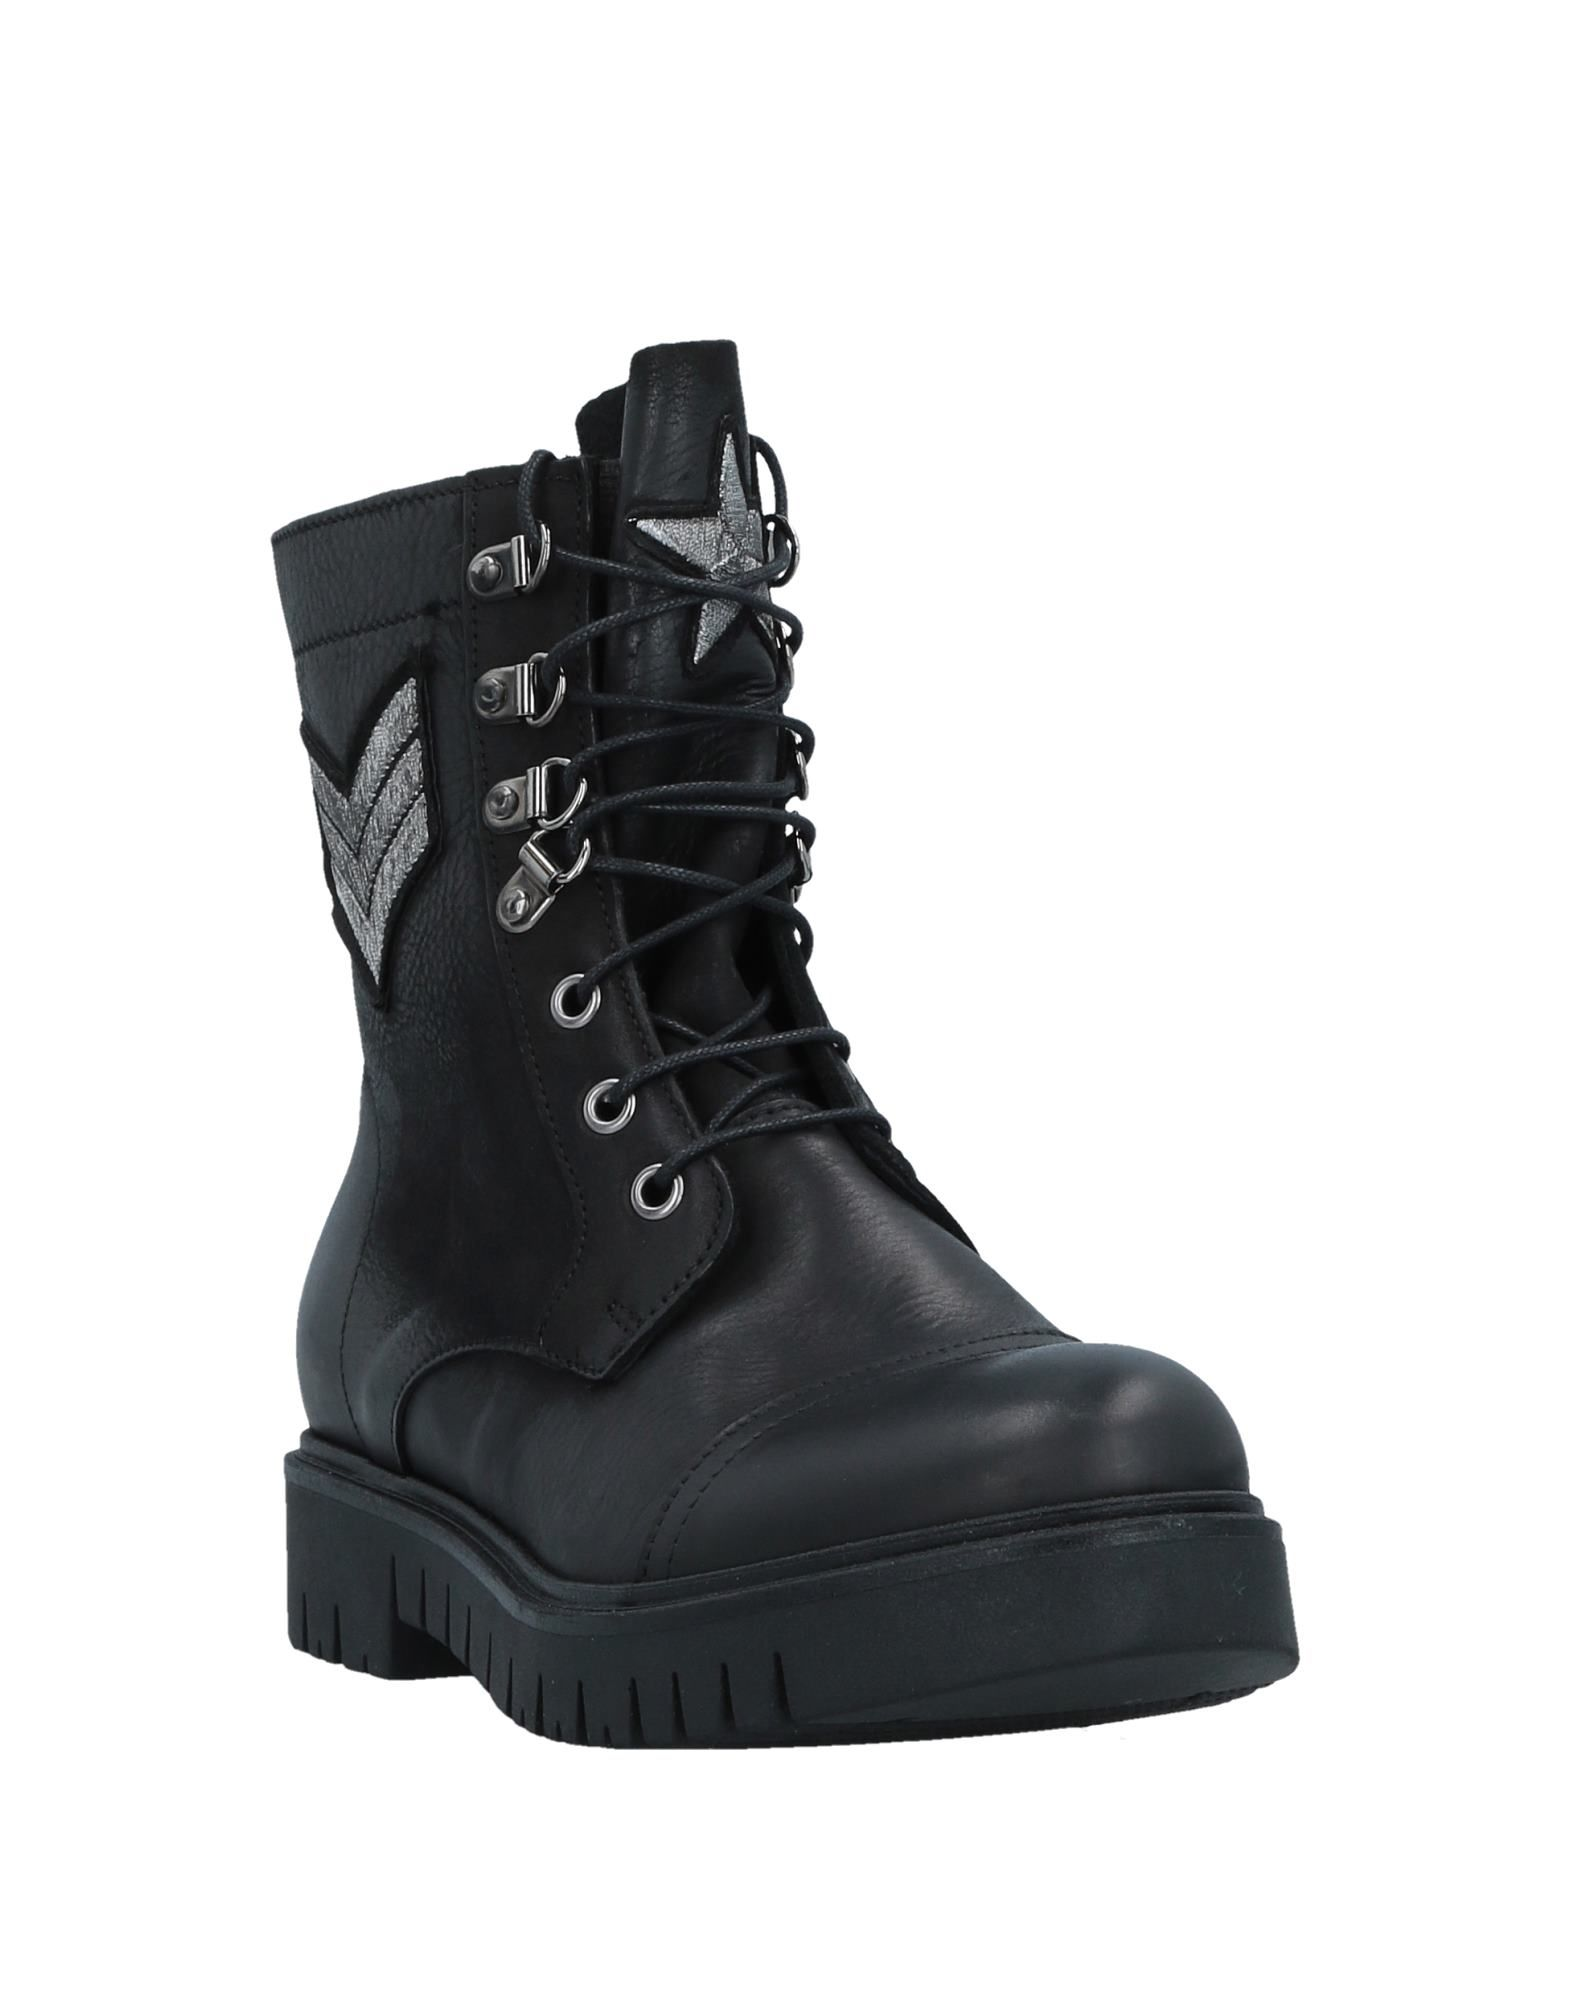 Stilvolle billige Stiefelette Schuhe Chocolà Stiefelette billige Damen  11528444WC b2401d